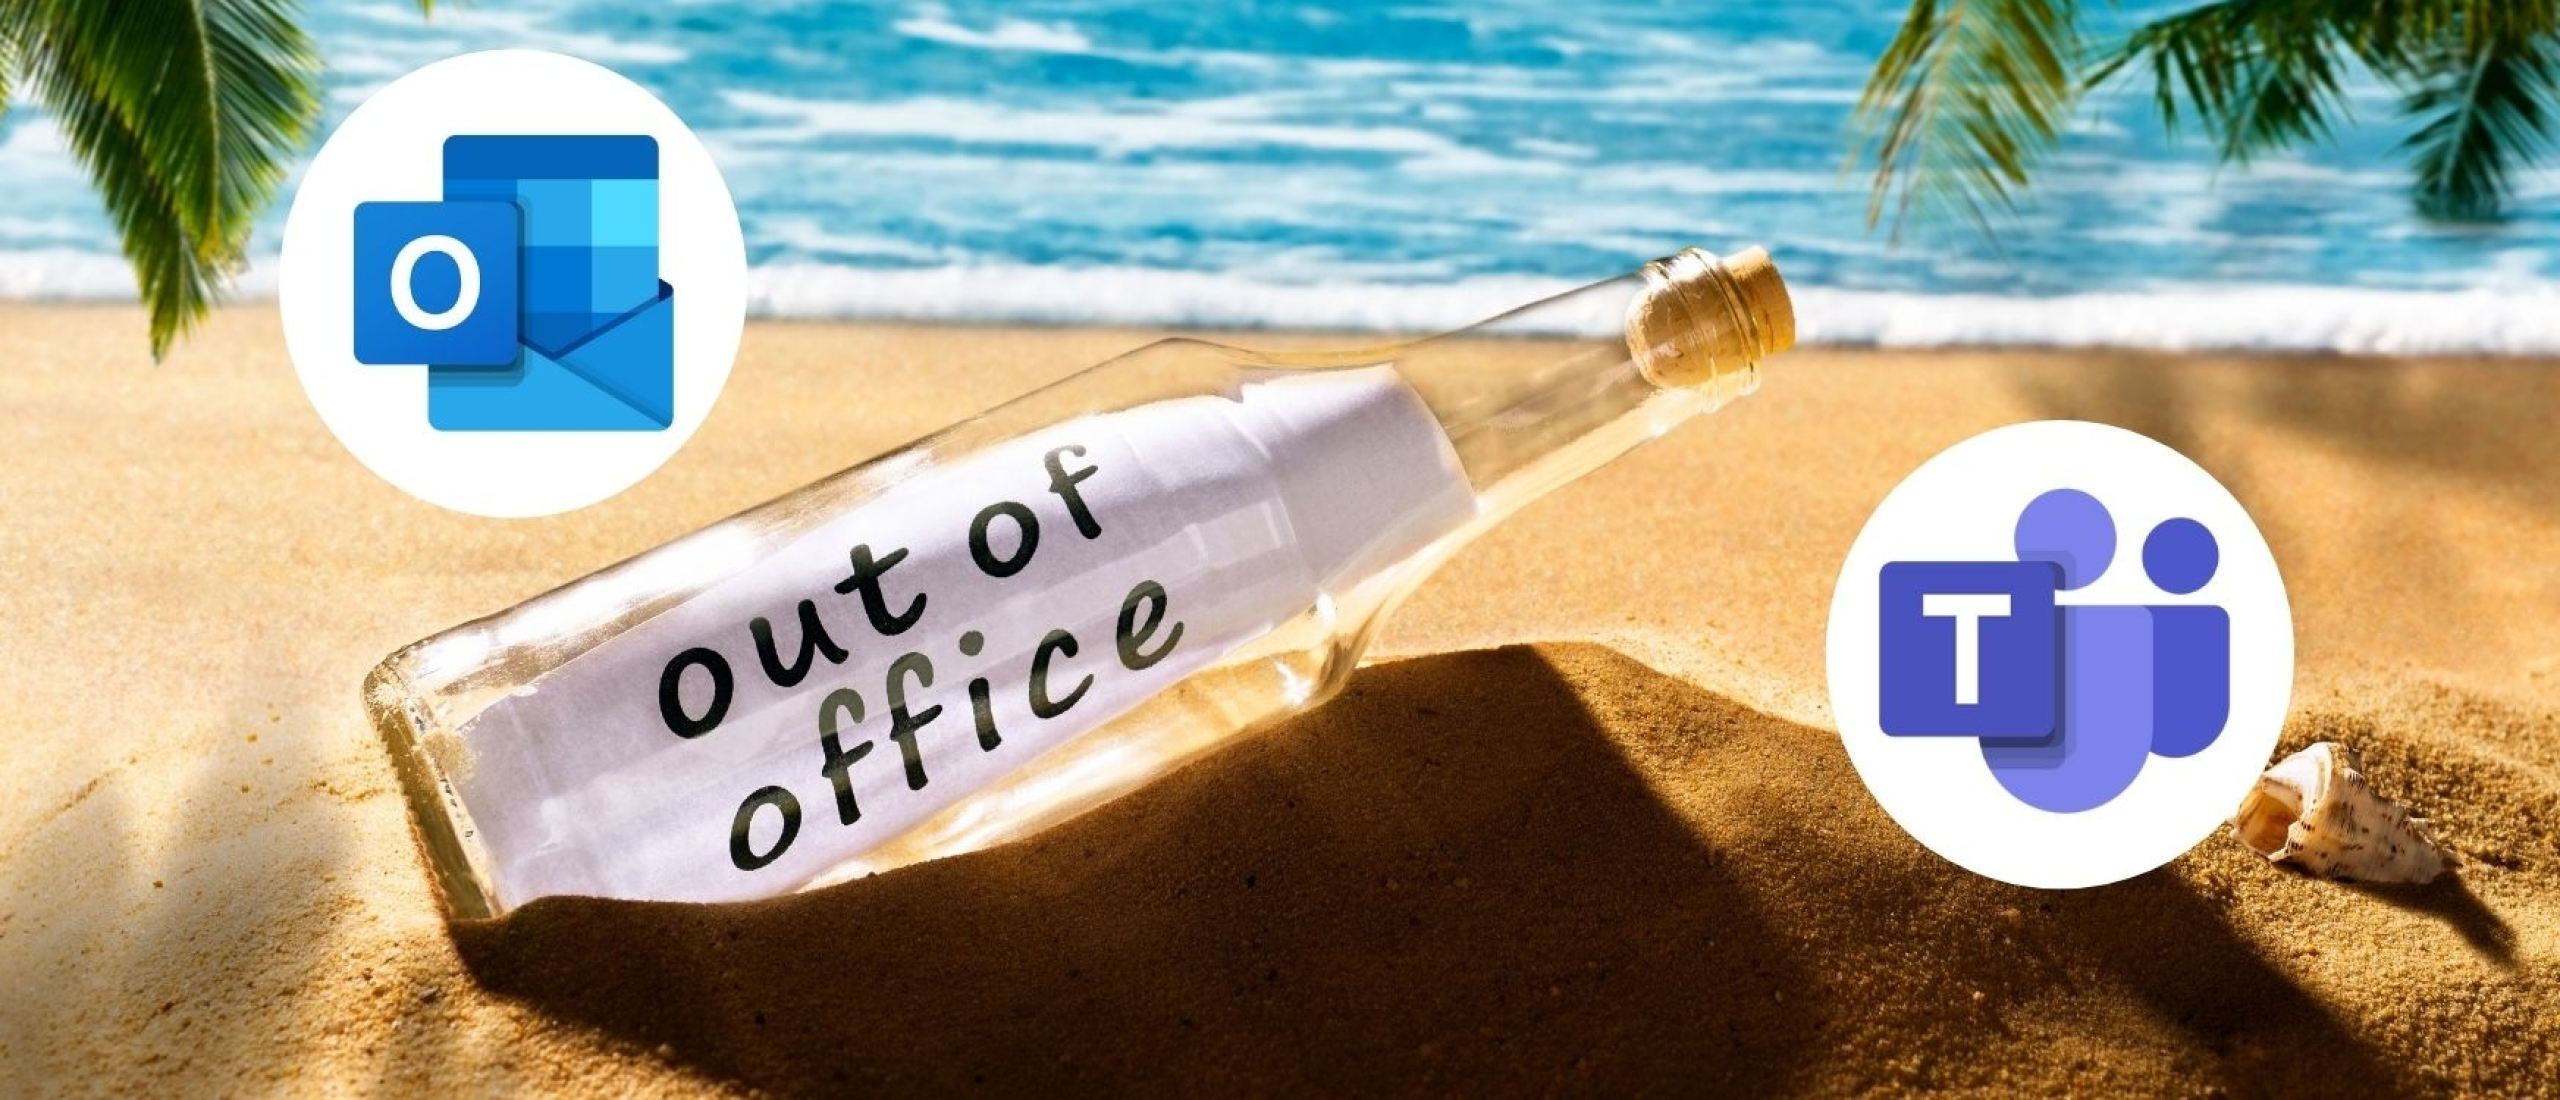 Afwezigheidsassistent Outlook: Tips voor de beste afwezigheidsmail